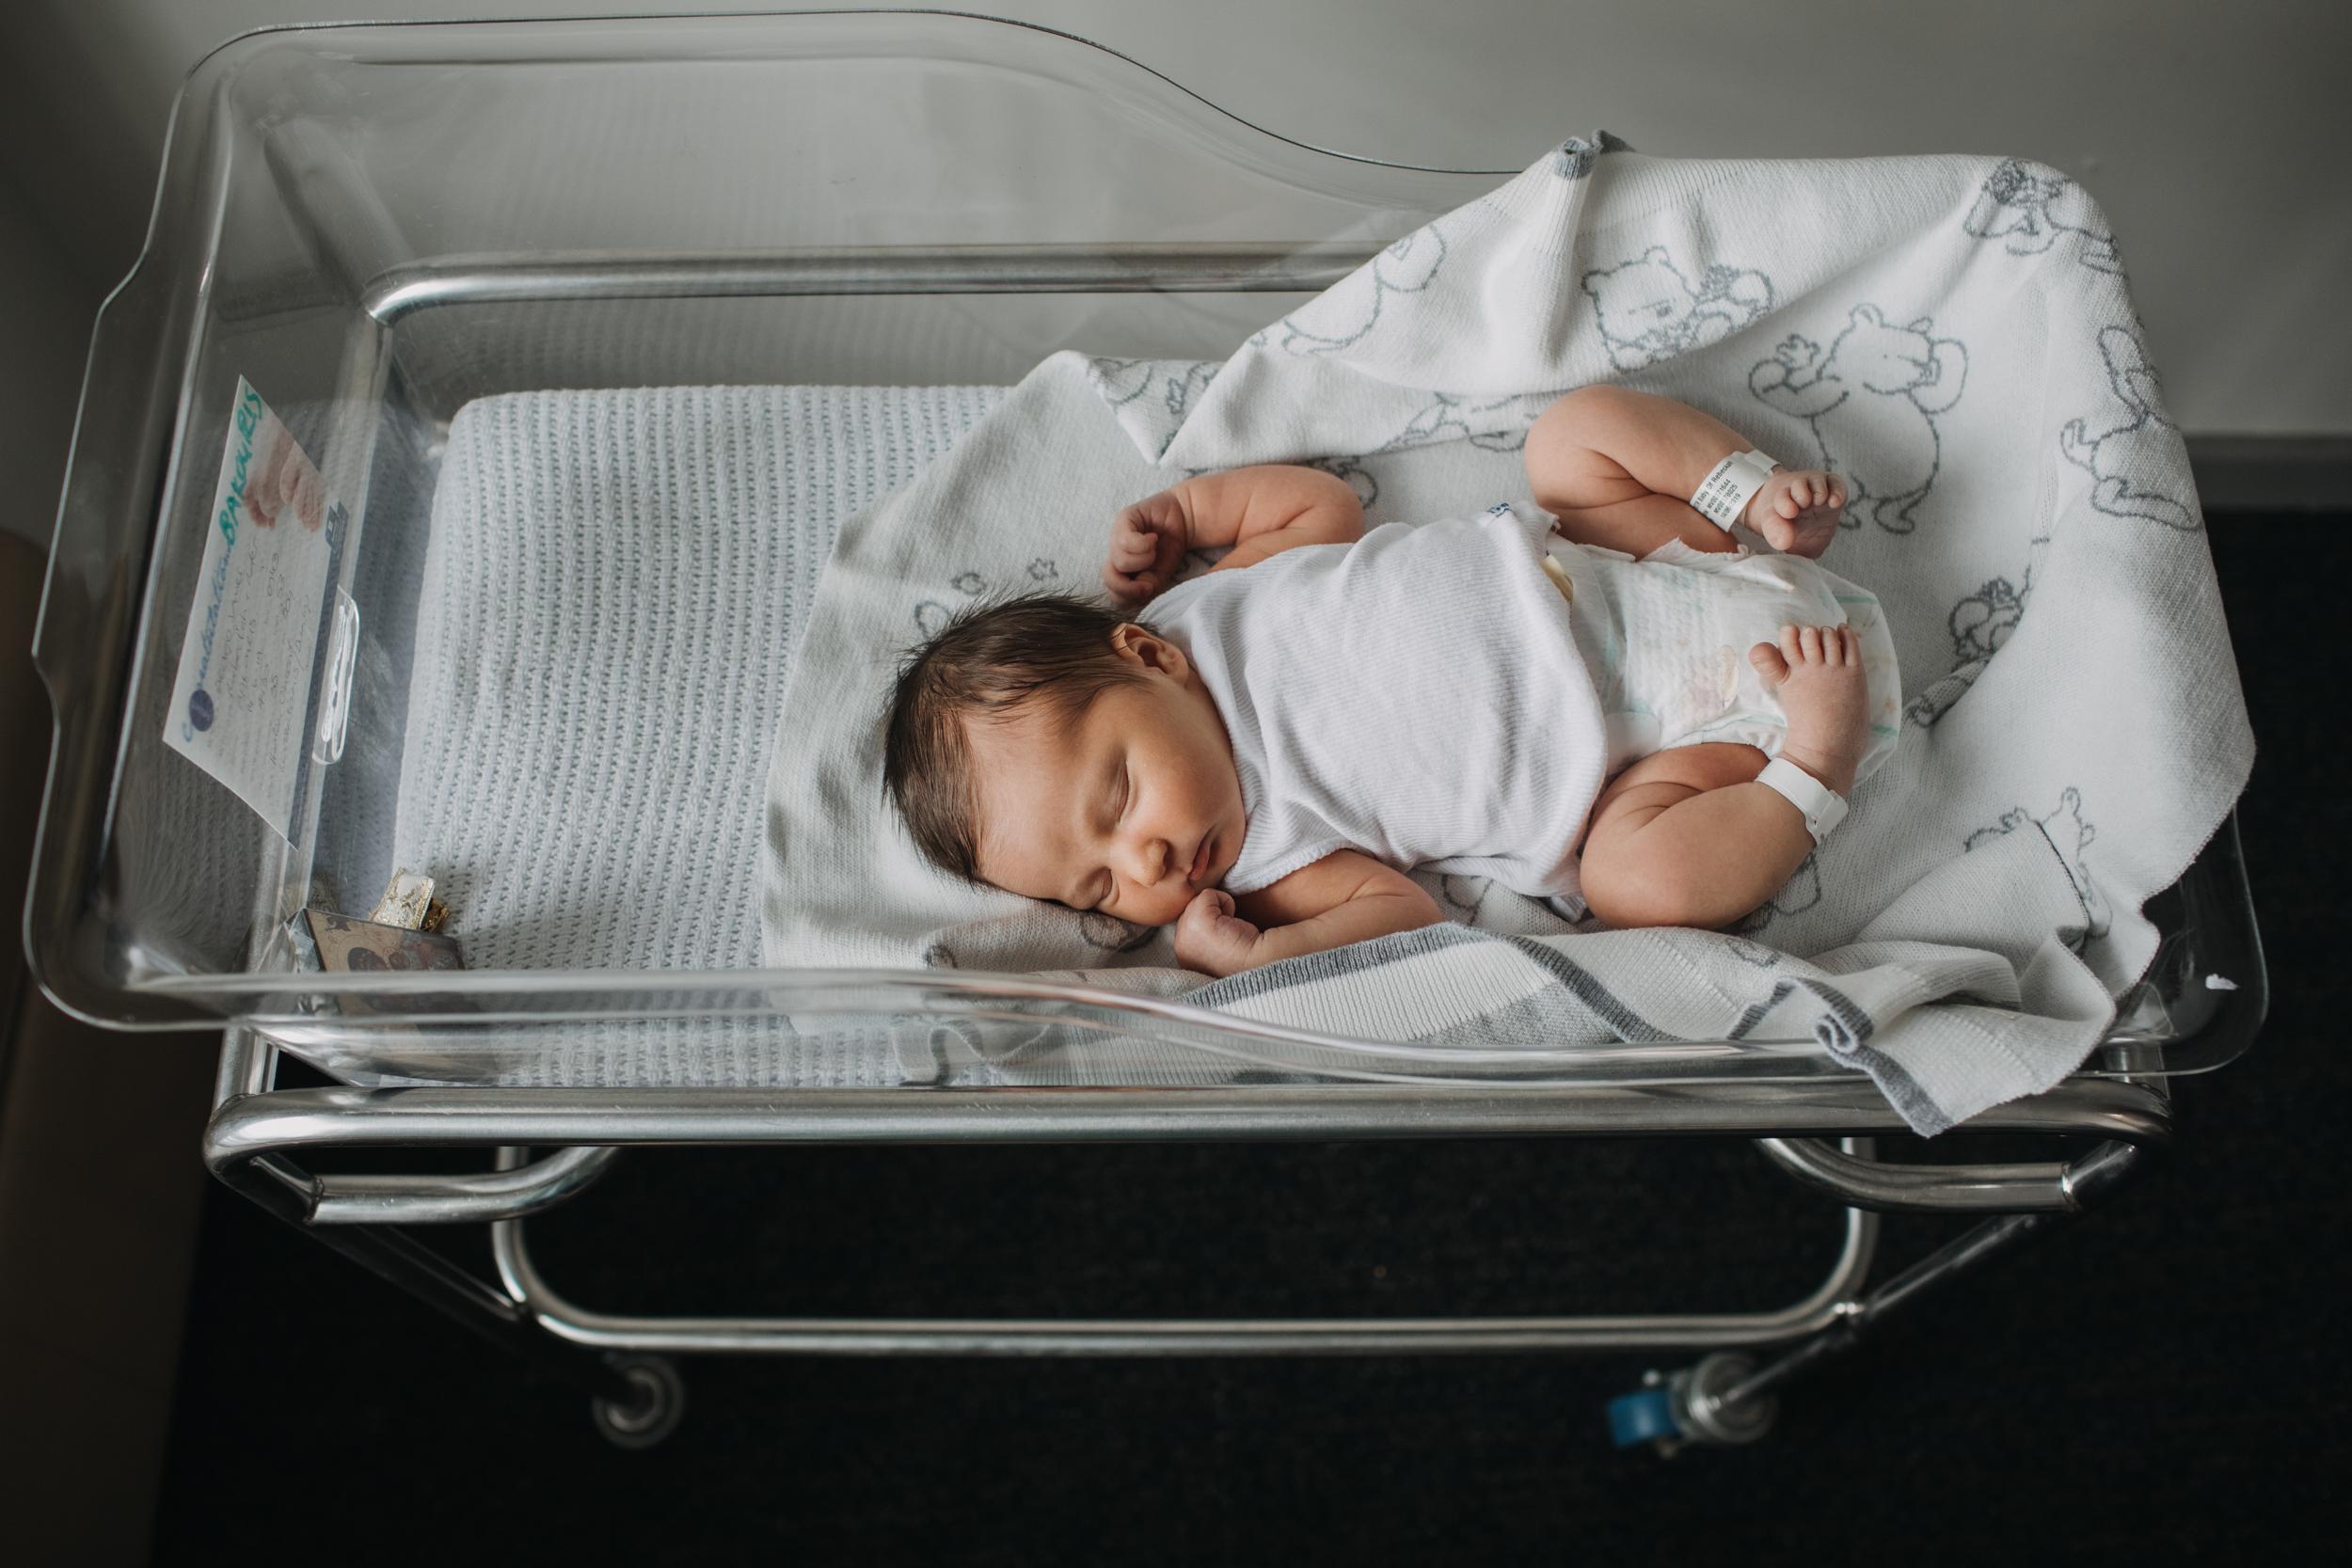 sheridan_nilsson_sydney_birth_photographer_newborn_photography-64 2.jpg